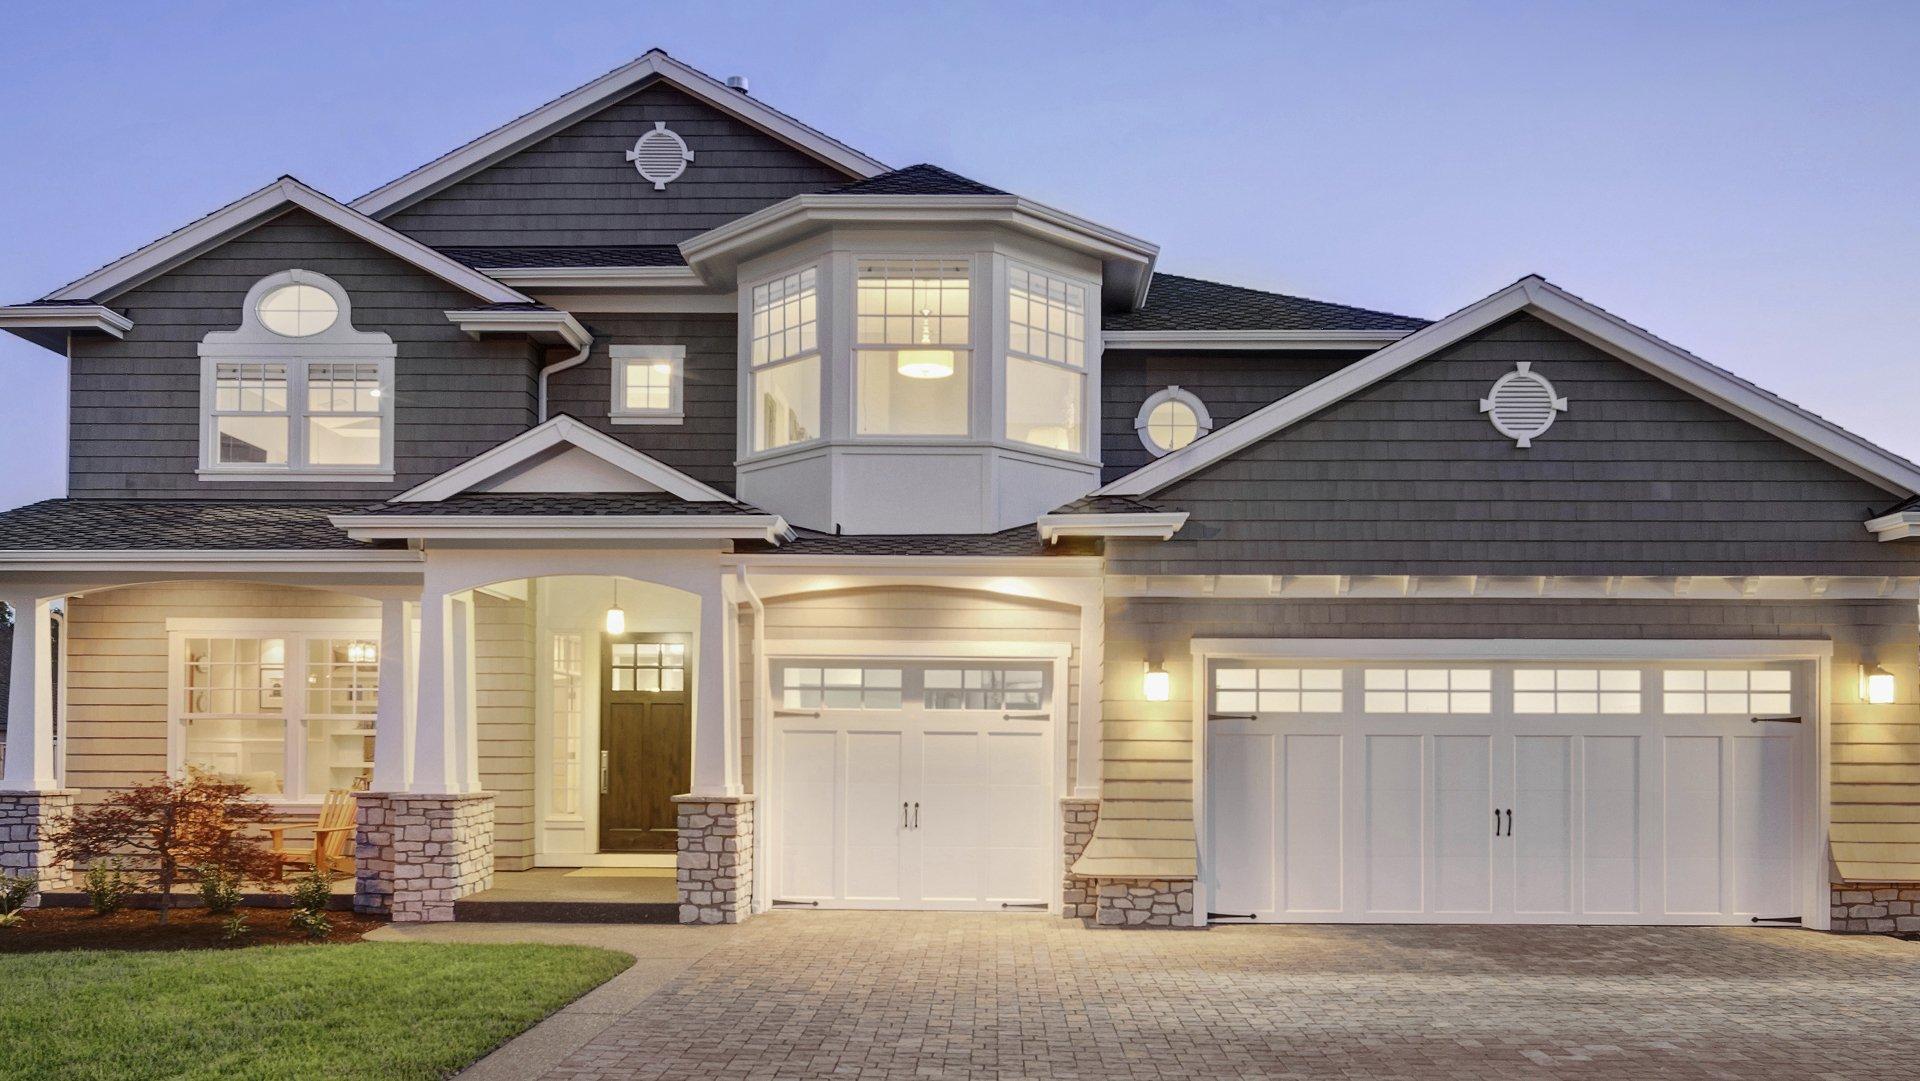 Emerald Coast Custom Homes Inc Custom Homes and Home Additions